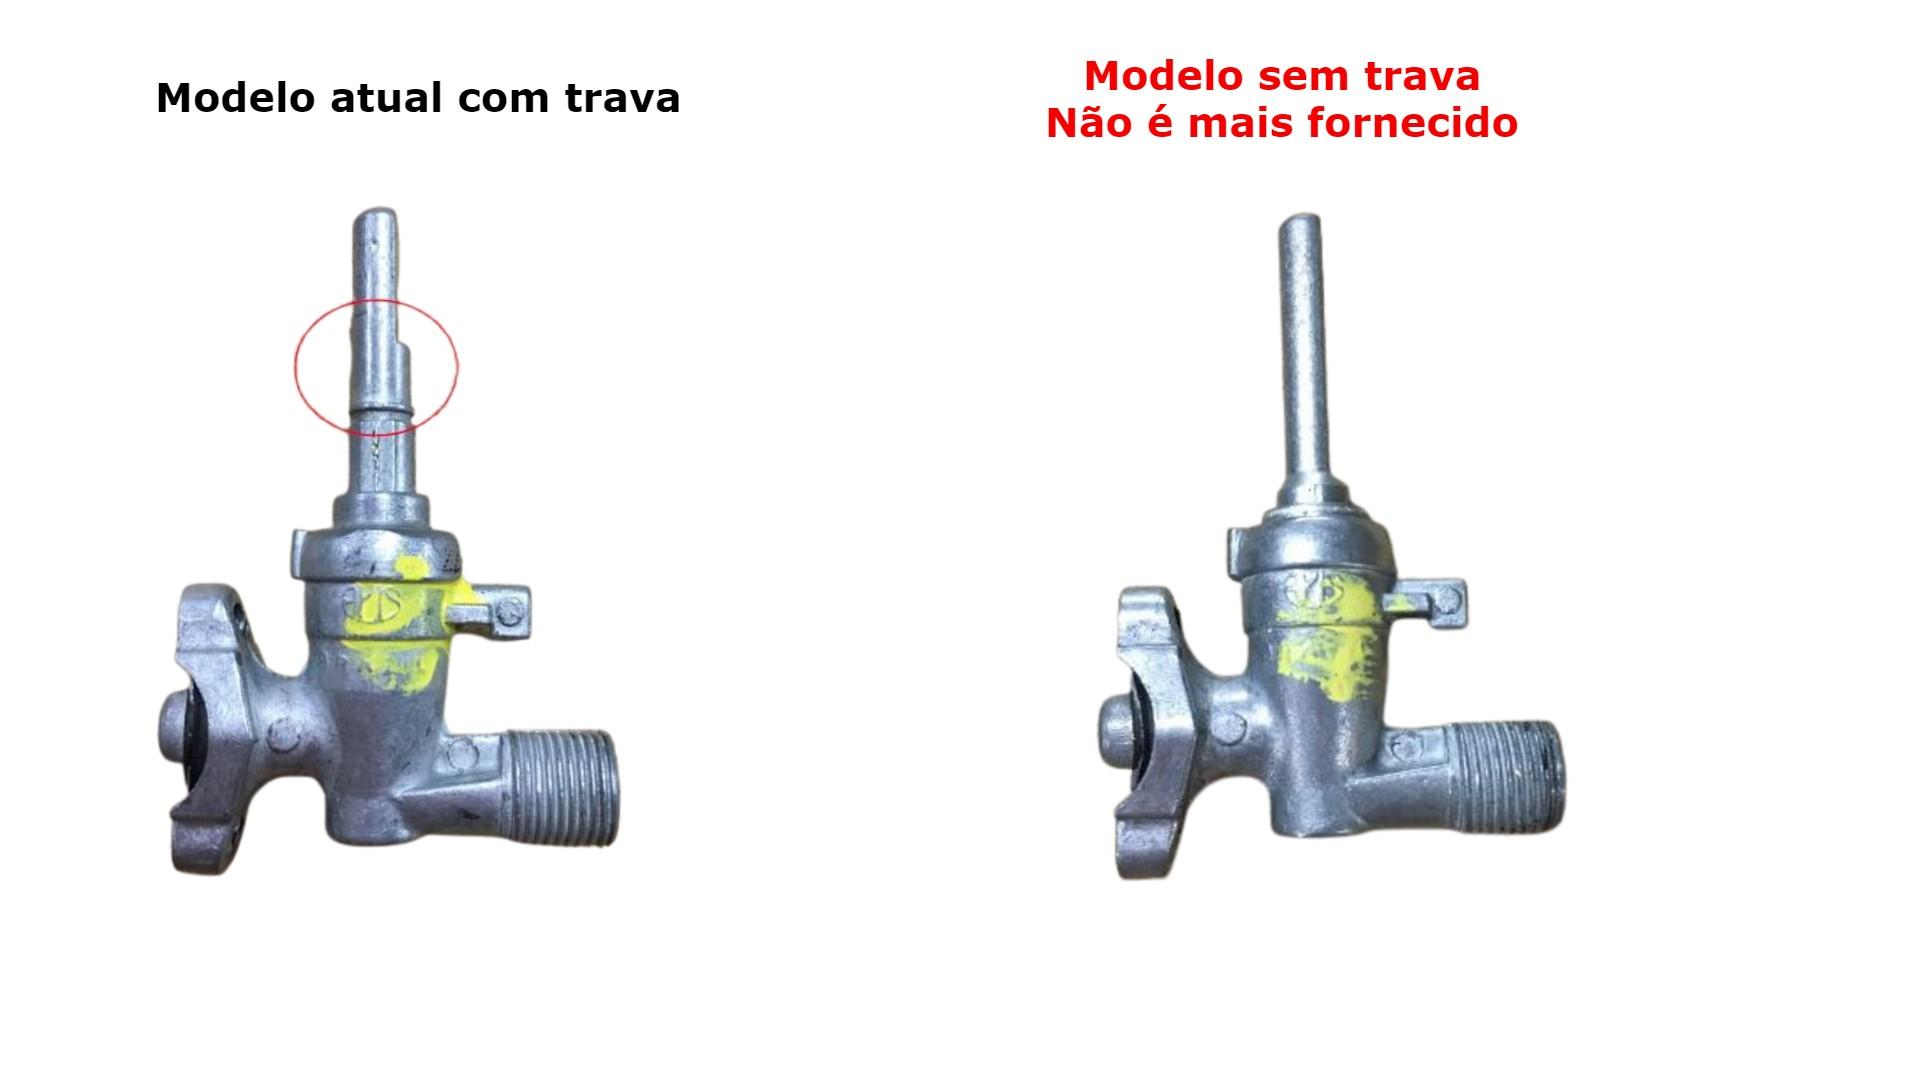 KIT REGISTRO VÁLVULA RAMAL FOGÃO COOKTOP FOGATTI 4 UN